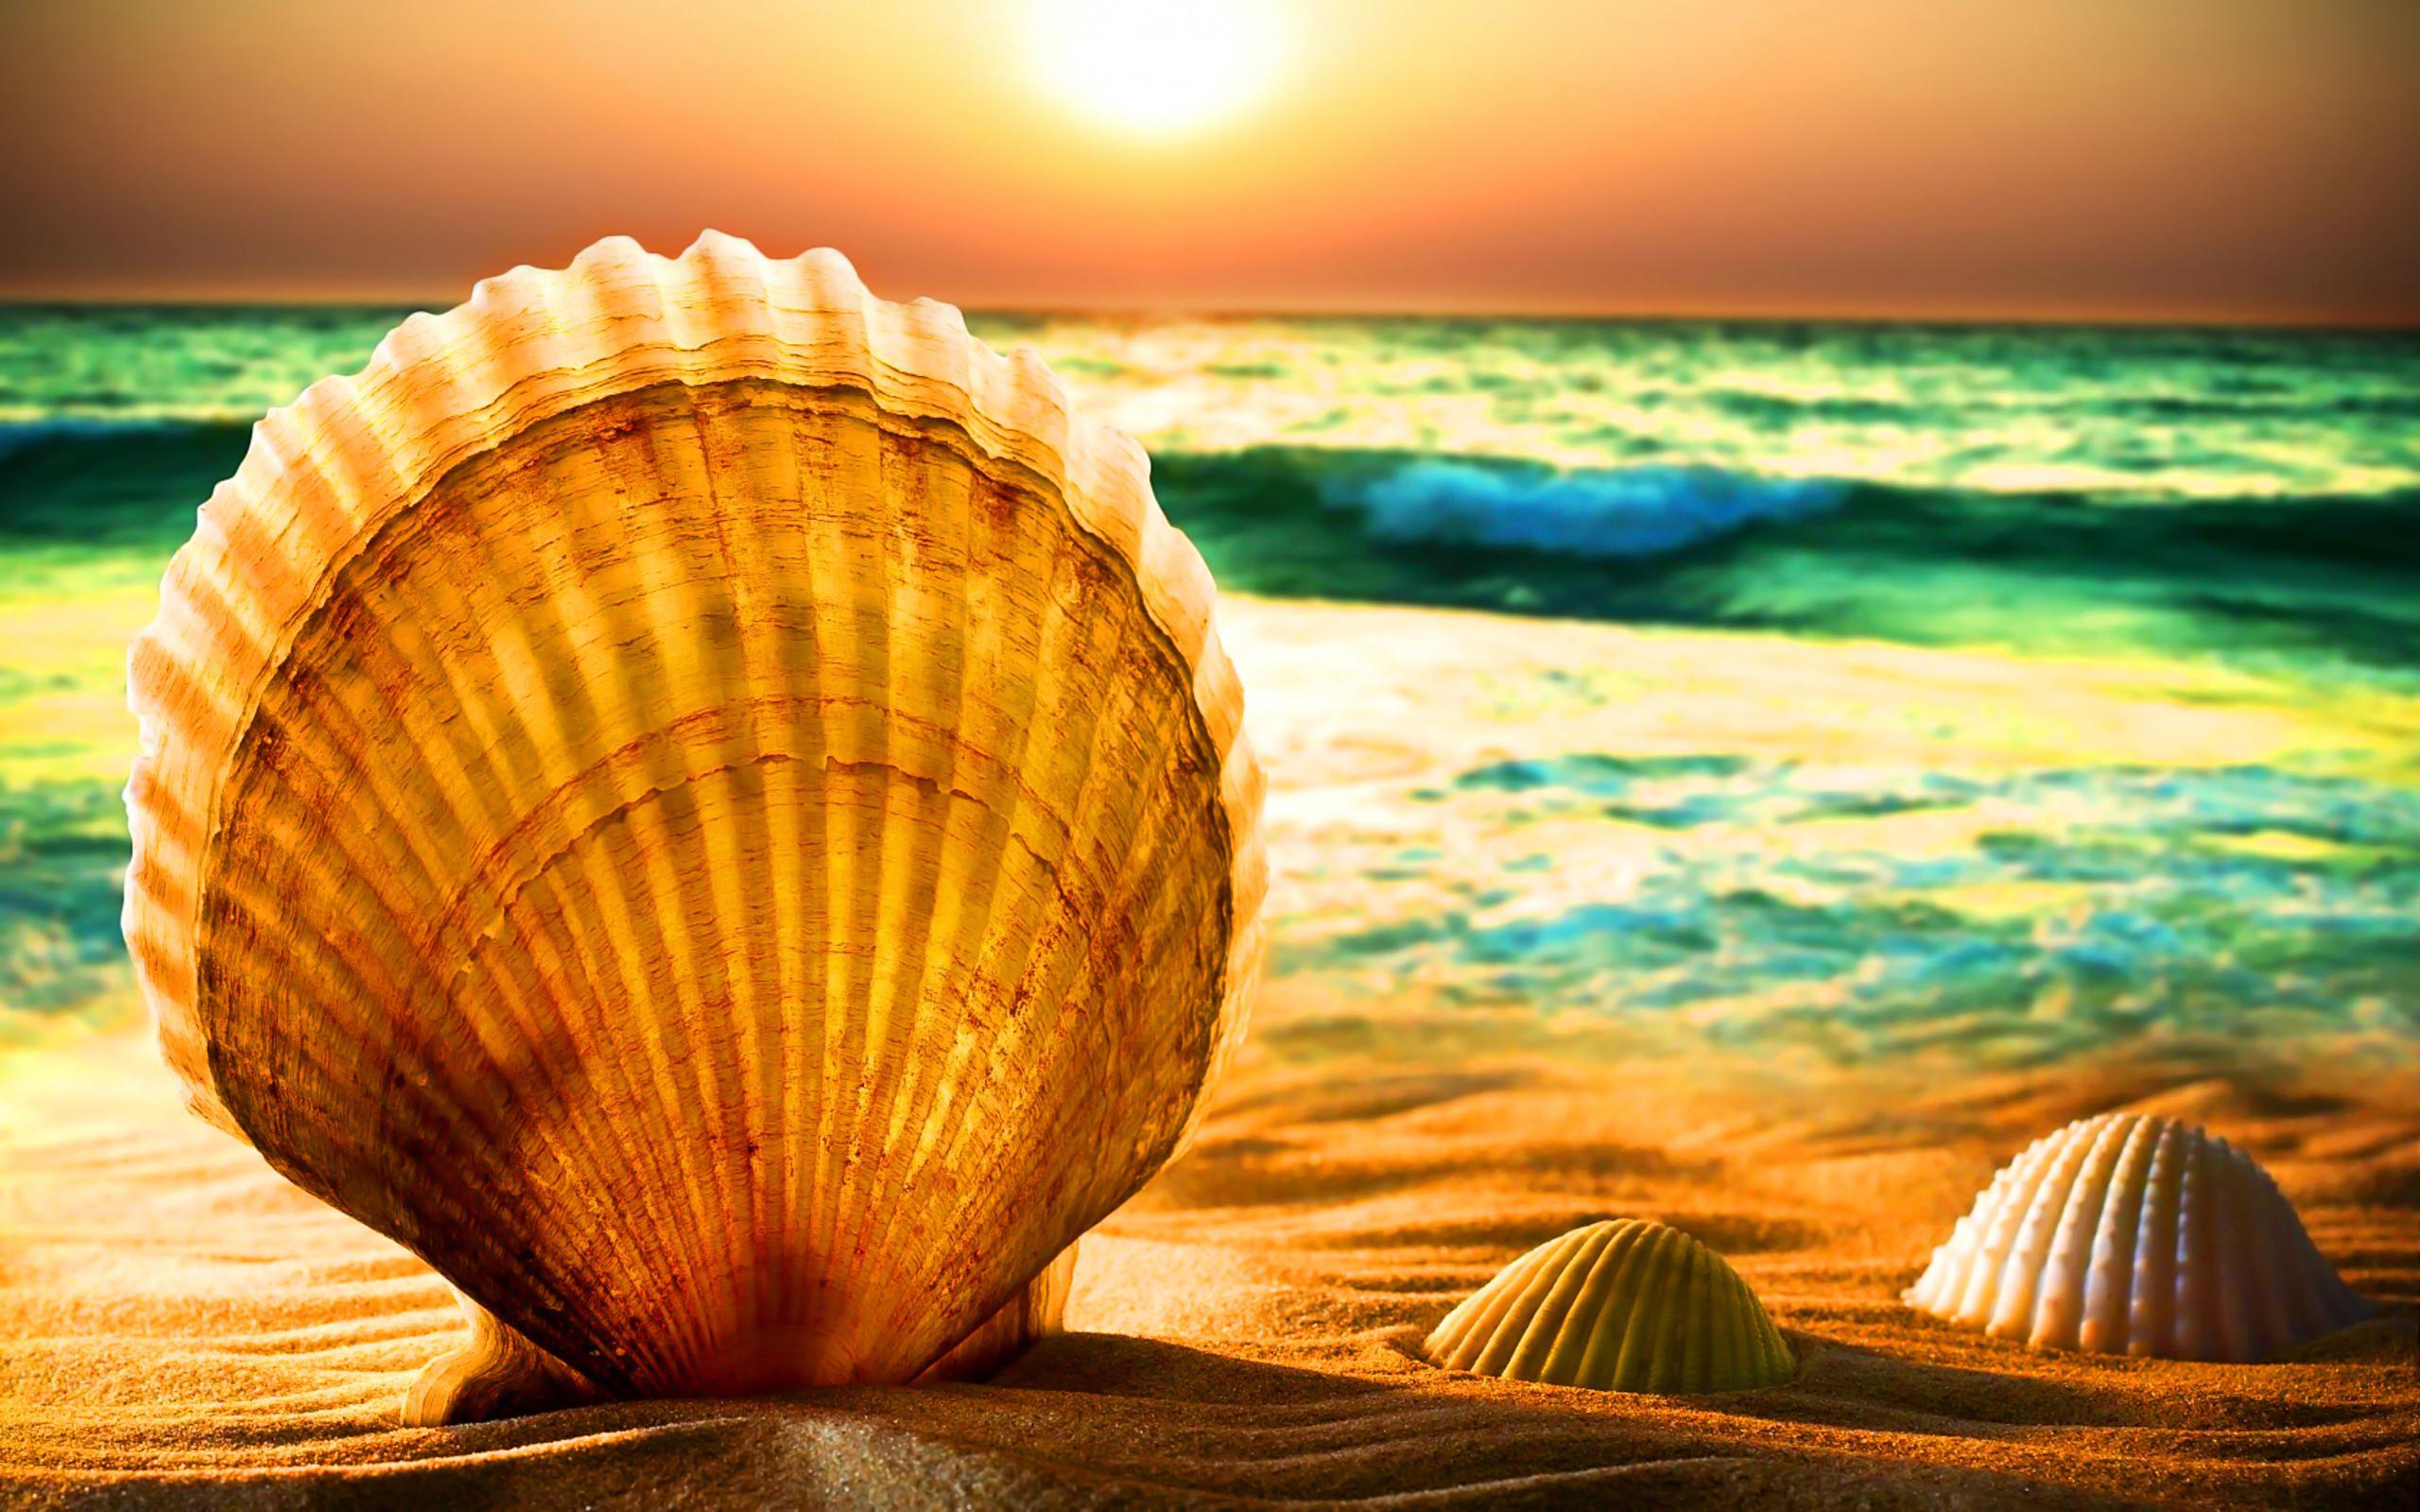 Summertime, 100% Quality HD Photos, Catriona Earney